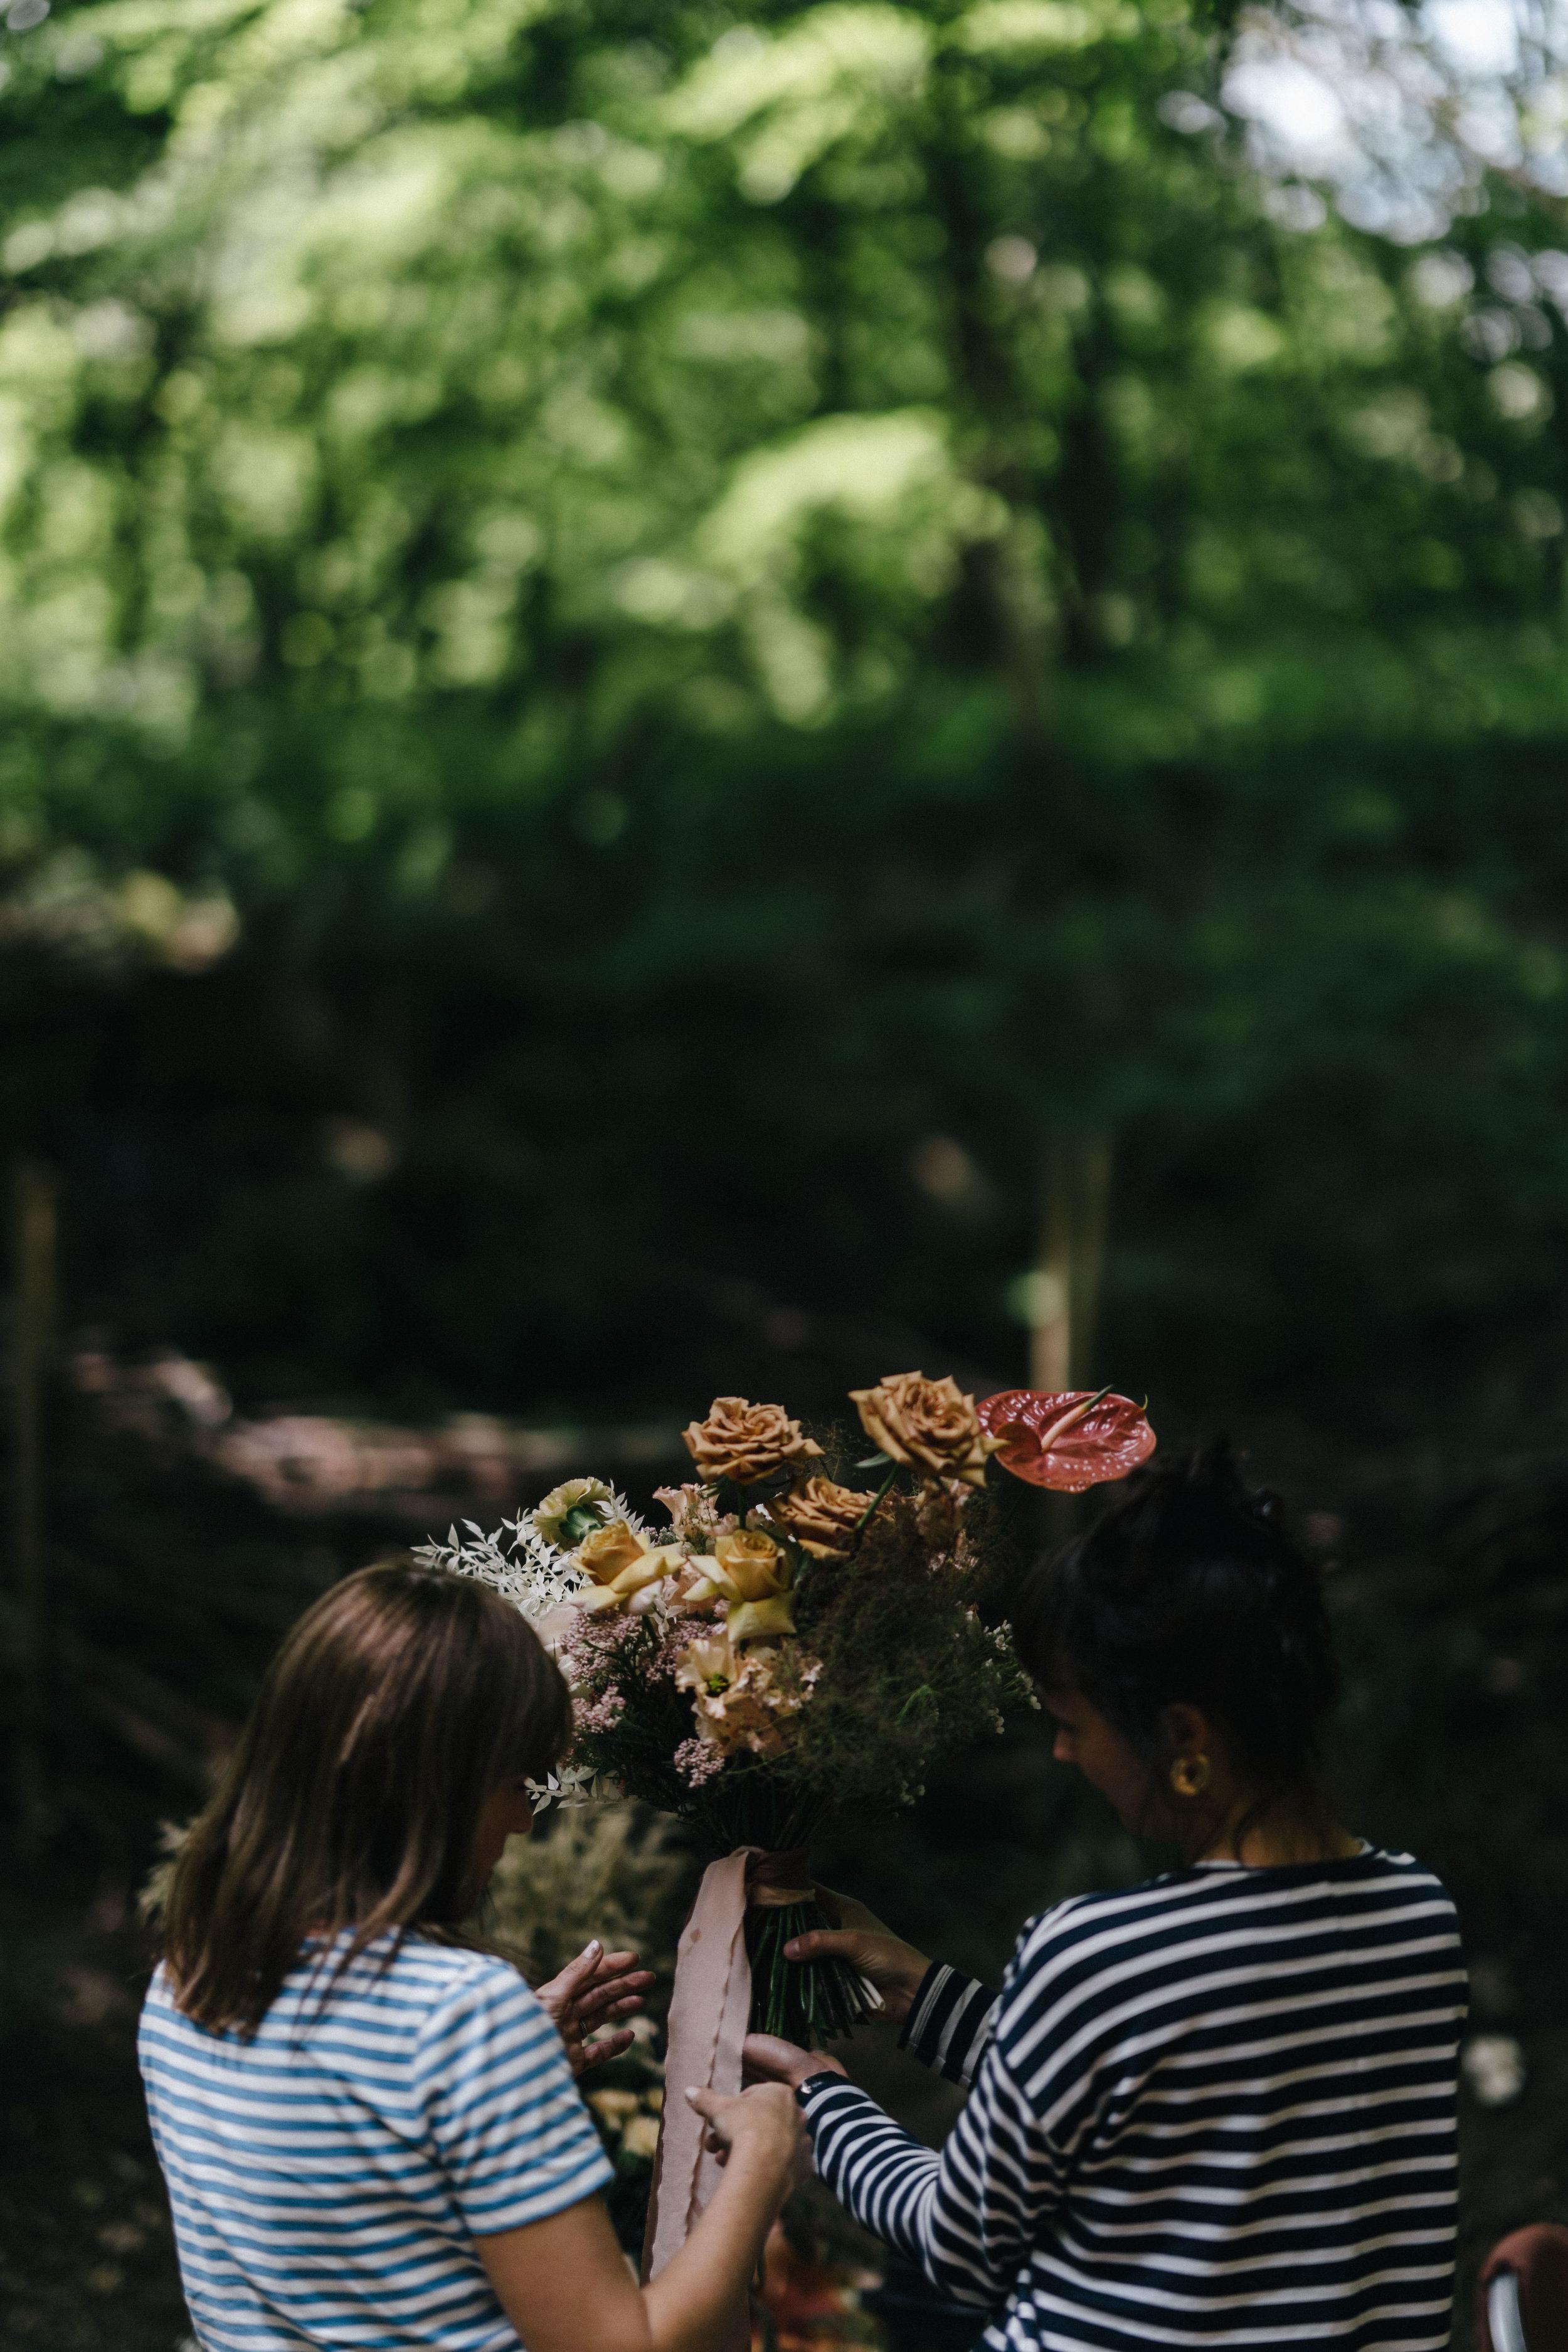 Zach&Grace_GreenAcres_2019_Stills (13 of 38).jpg